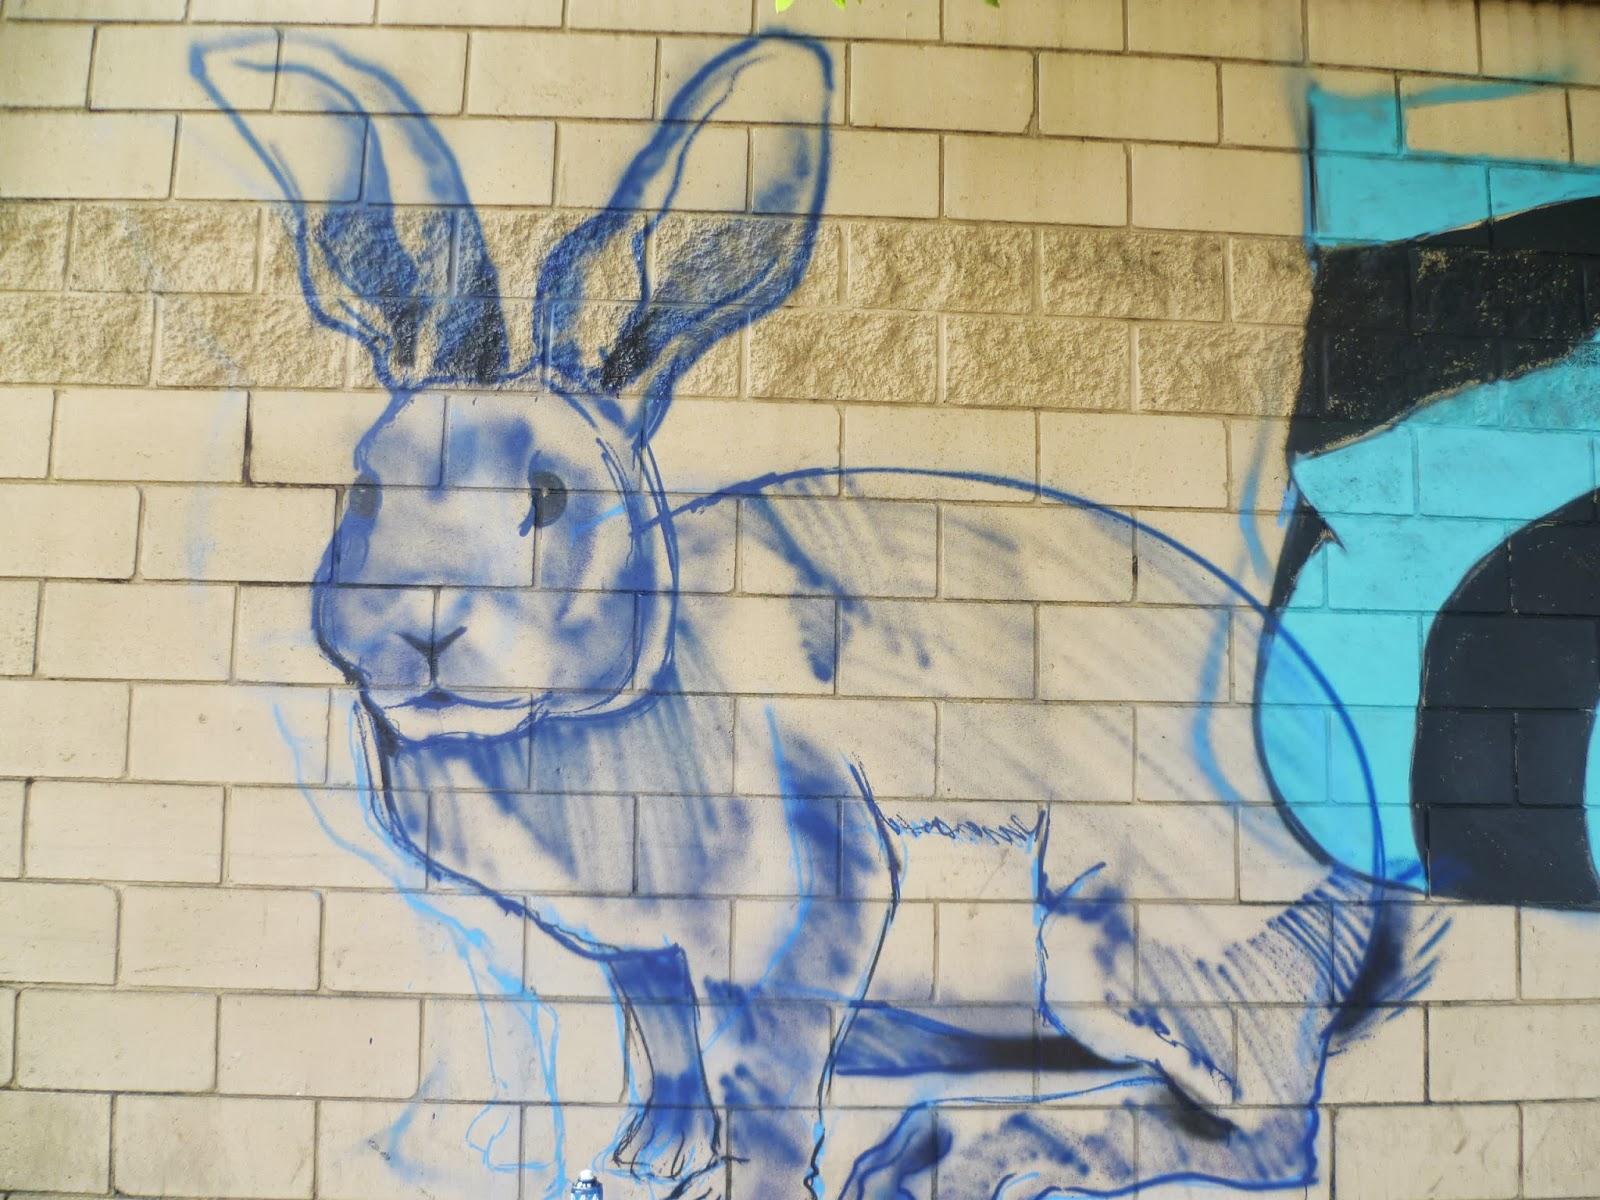 Meeting Of Styles, Barracas, Street Art Argentina, Elisa N, Blog de Viajes, Lifestyle, Travel